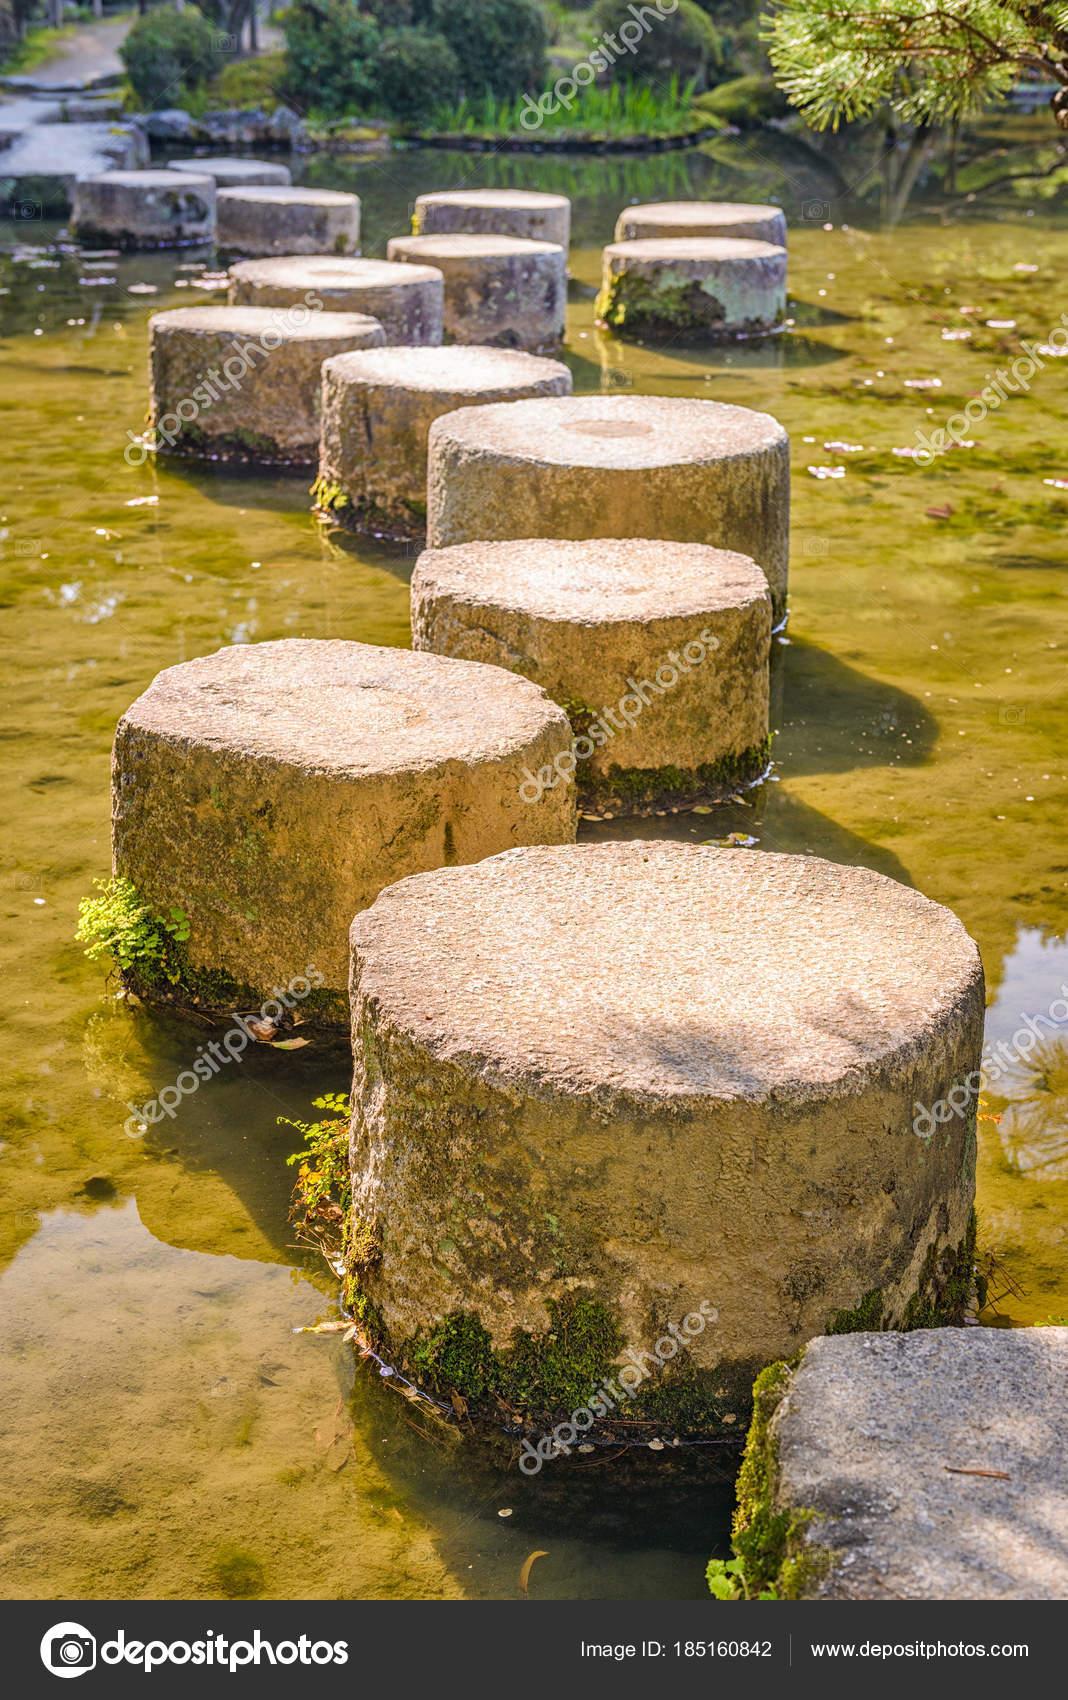 Stepping Stones in Japan — Stock Photo © sepavone #185160842